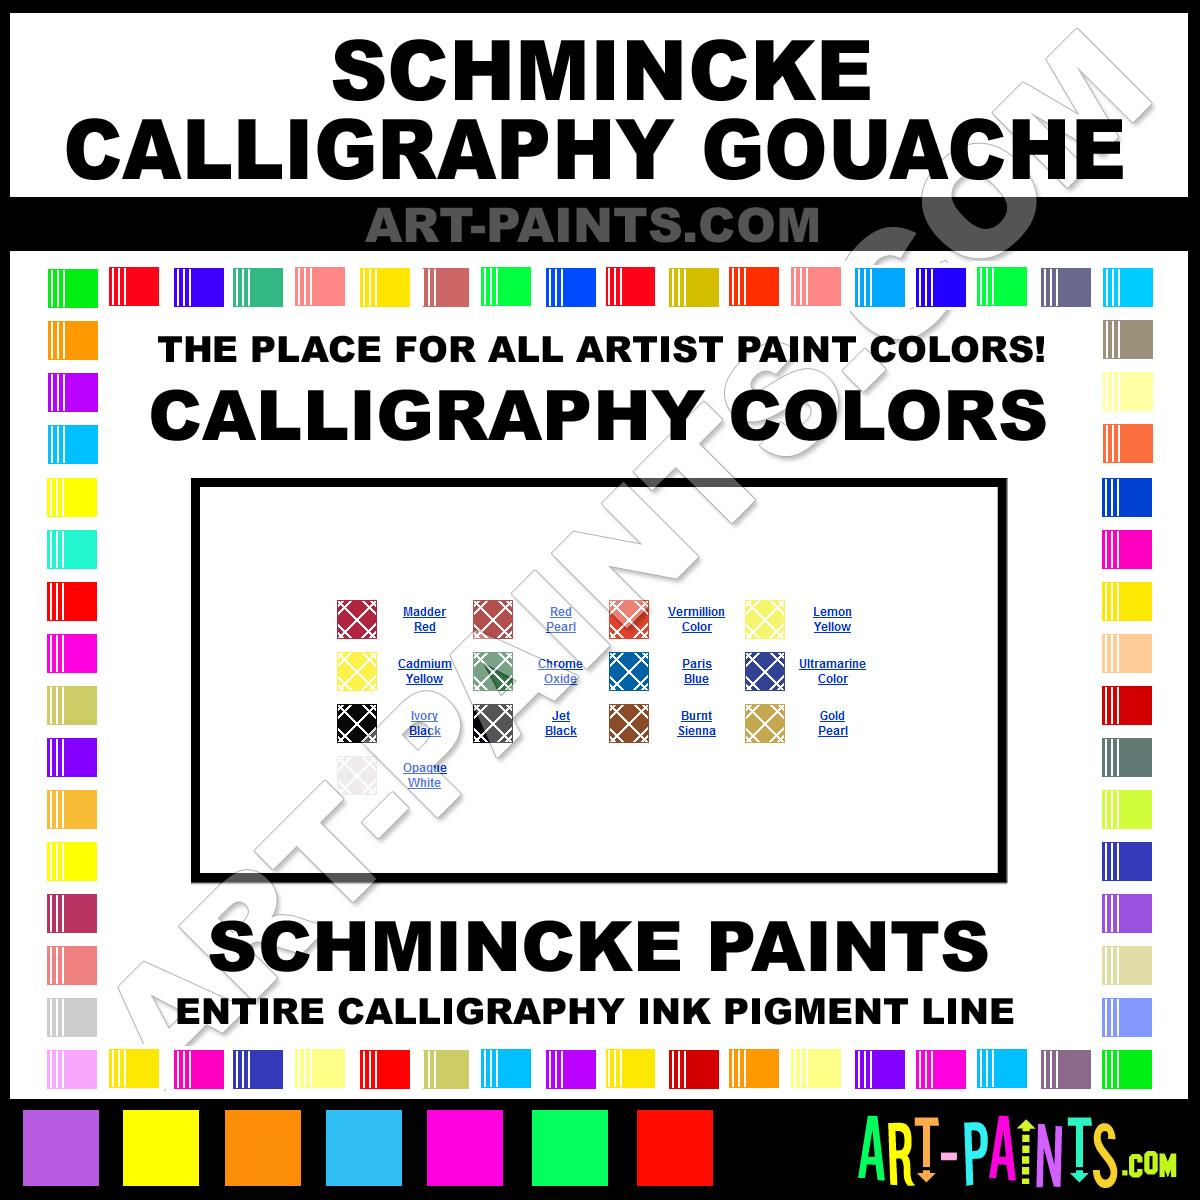 Schmincke Calligraphy Gouache Calligraphy Ink Paint Colors